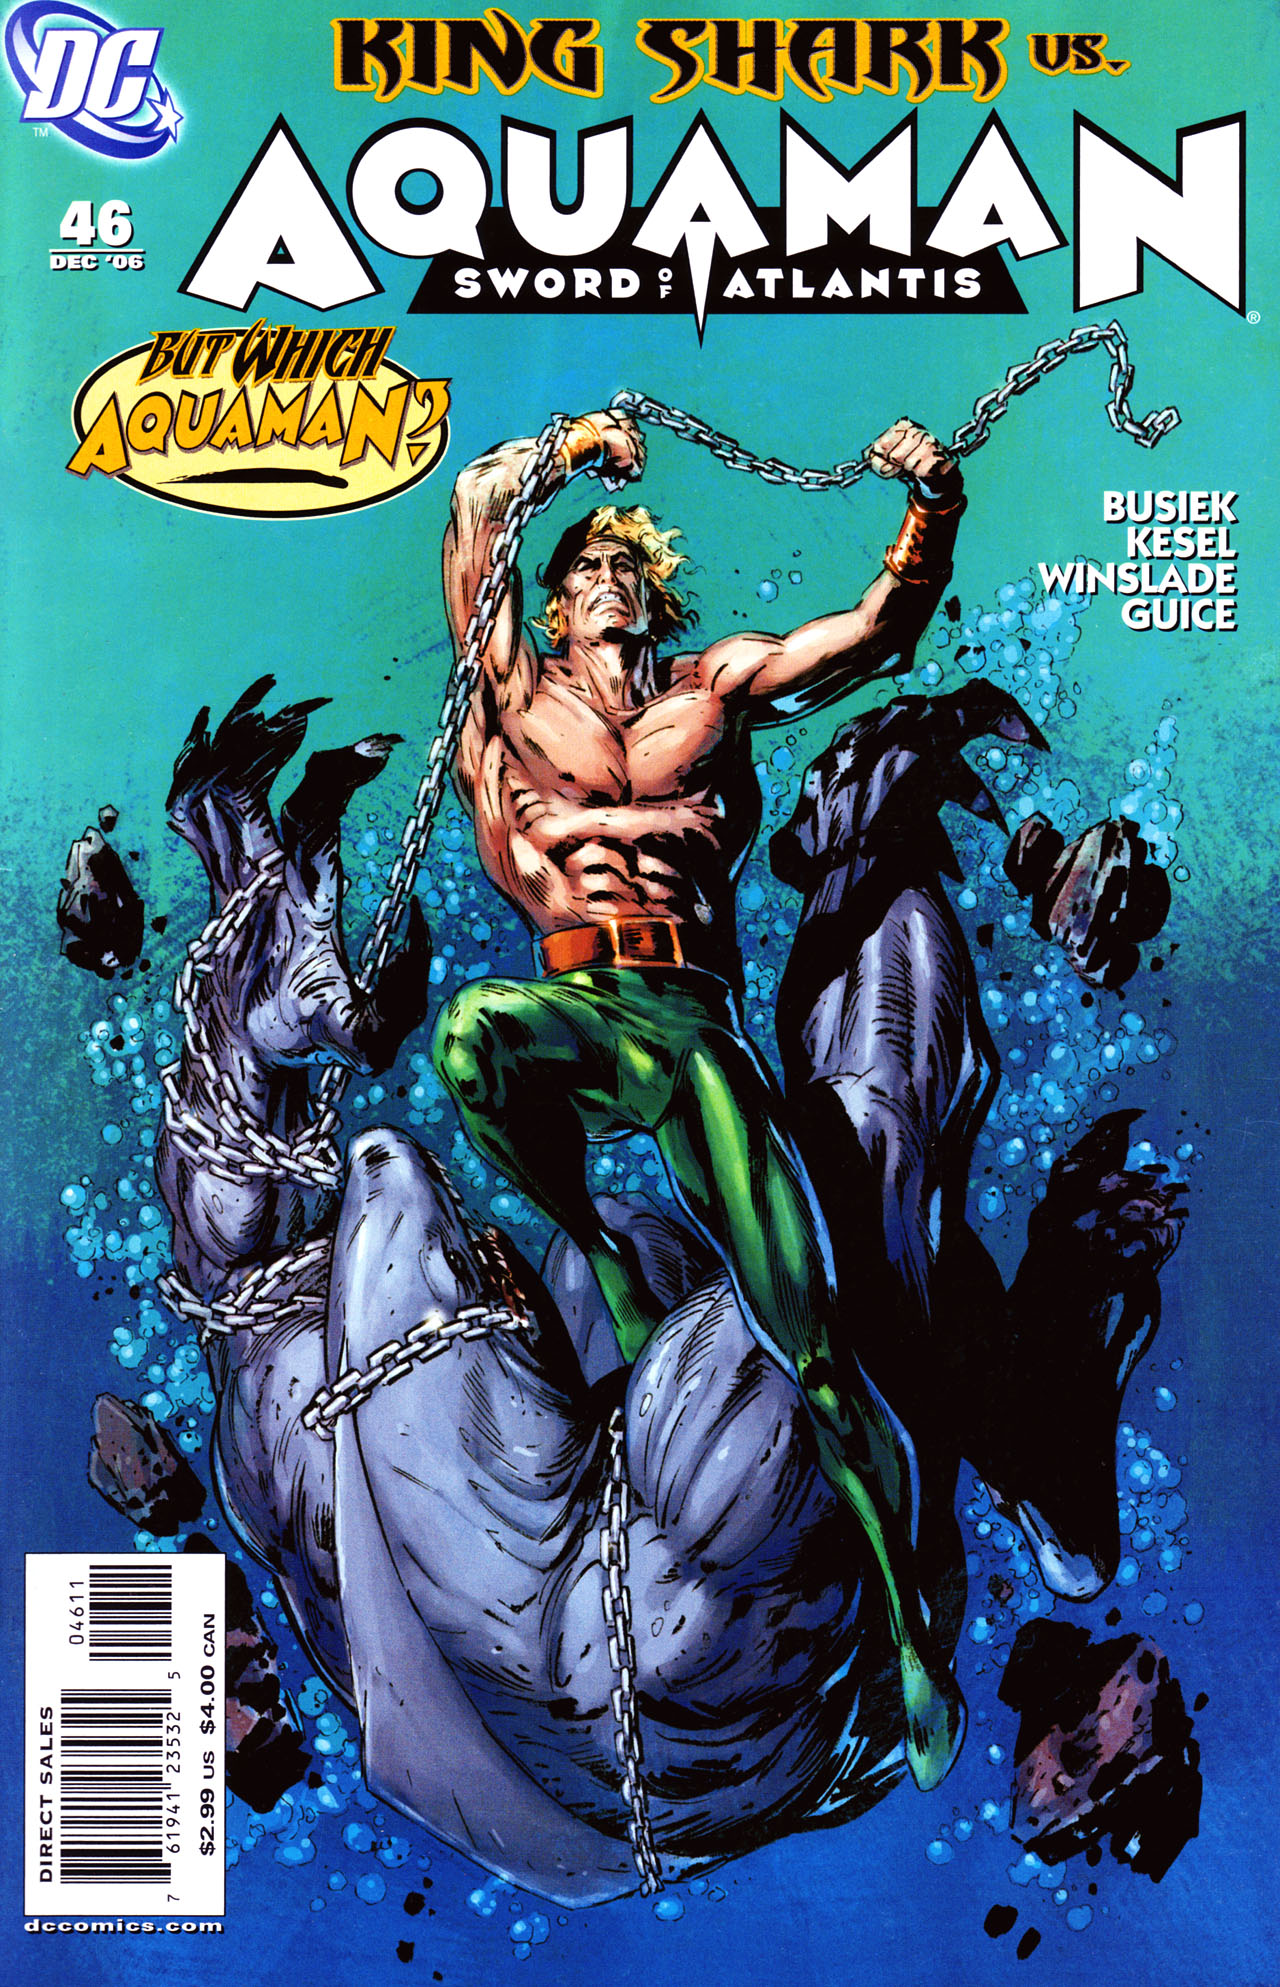 Aquaman: Sword of Atlantis 46 Page 1